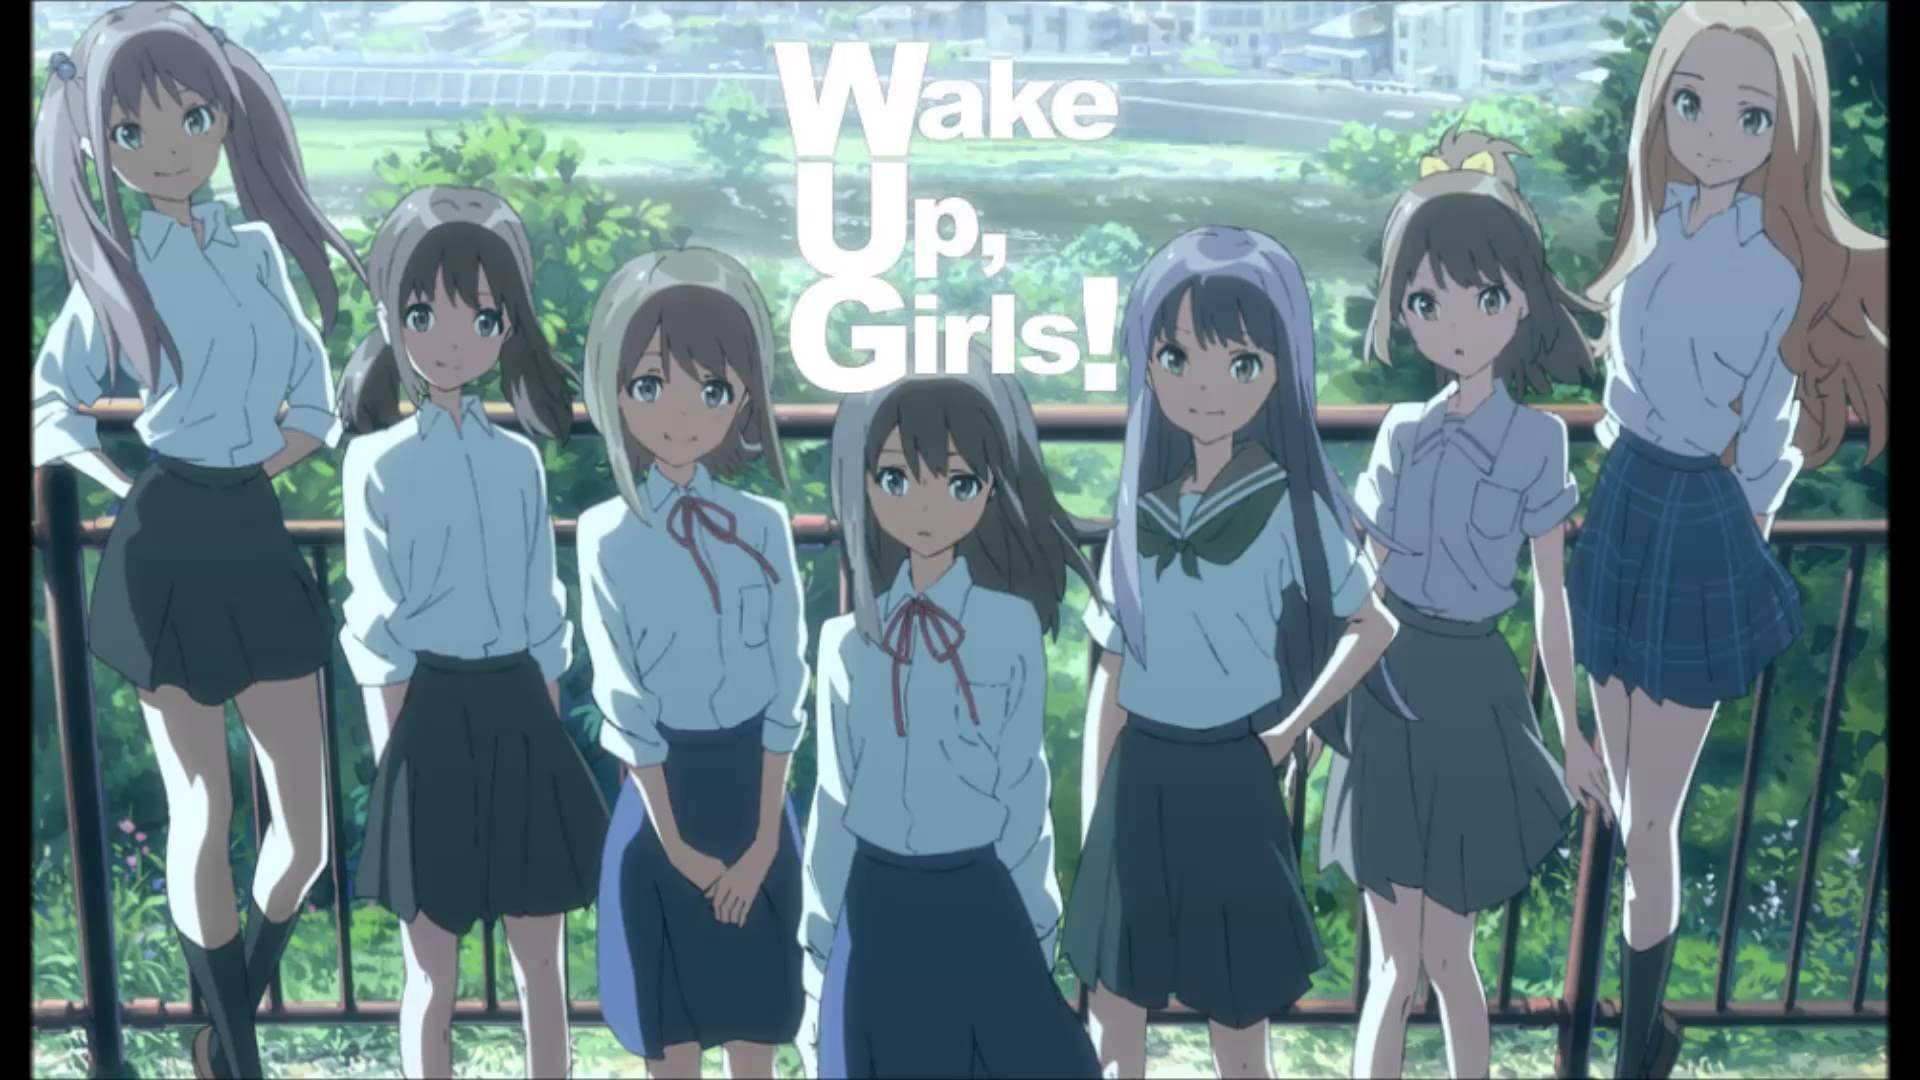 Tachiagare Wake Up Girls 人気 アニメ アニメ 大物